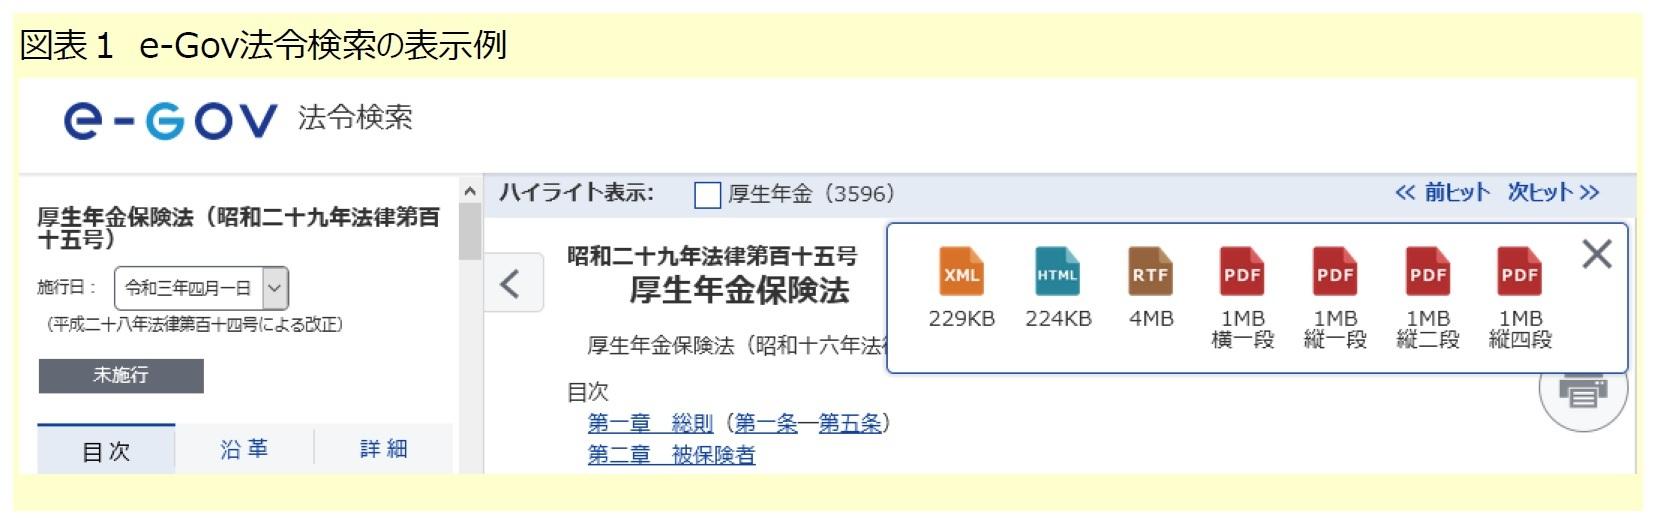 図表1 e-Gov法令検索の表示例